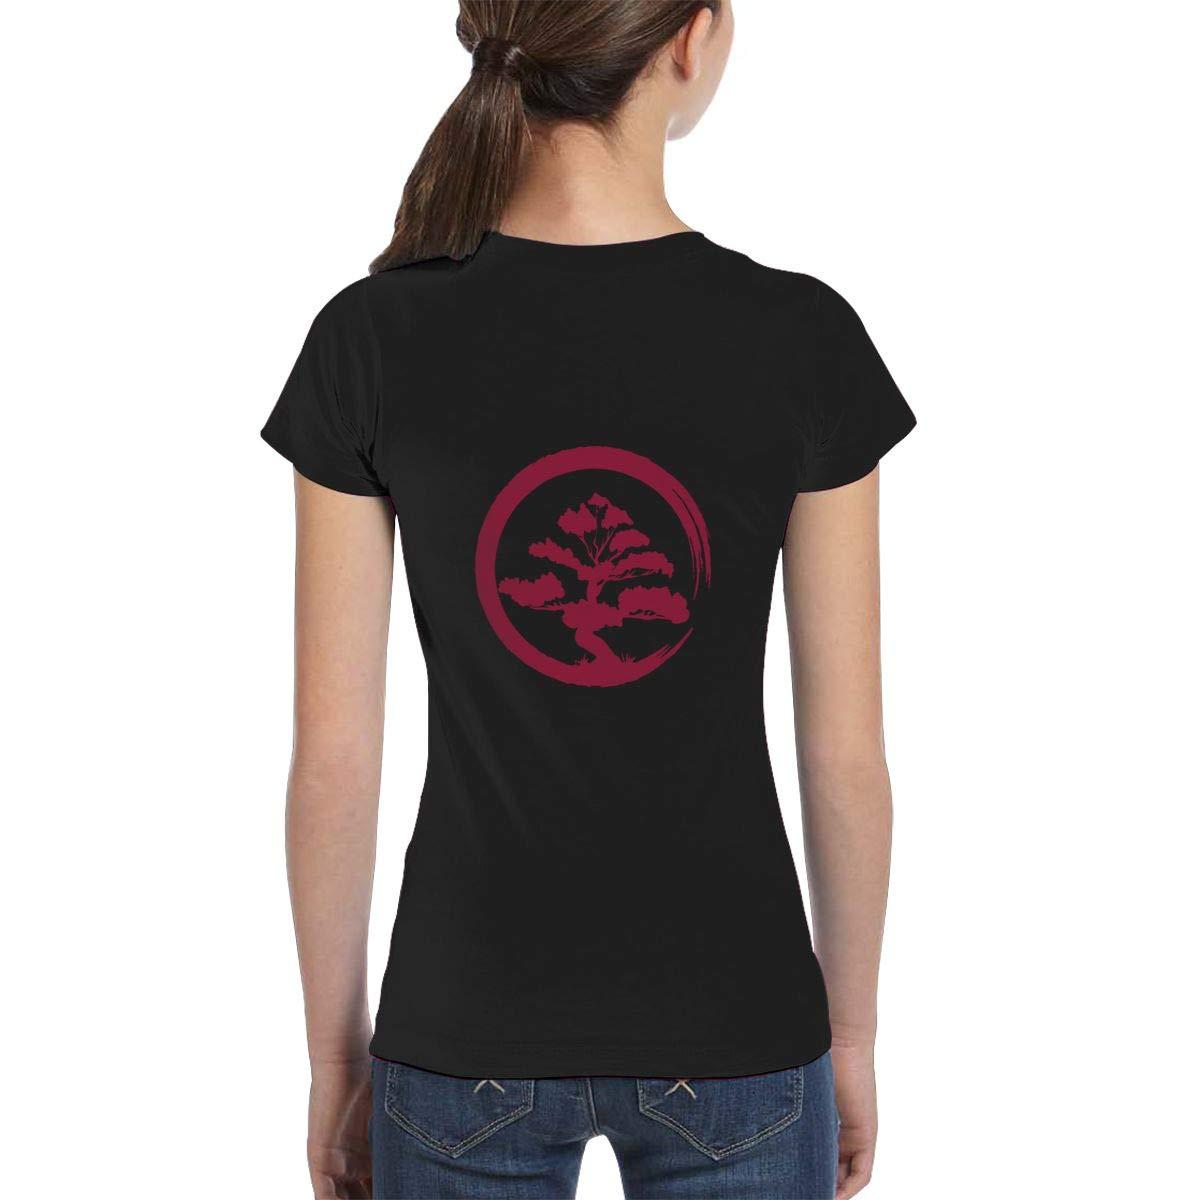 Casual Tunic Shirt Dress XS-XL L6Nv4o@A Girls Short Sleeve Bonsai Tree Shirts